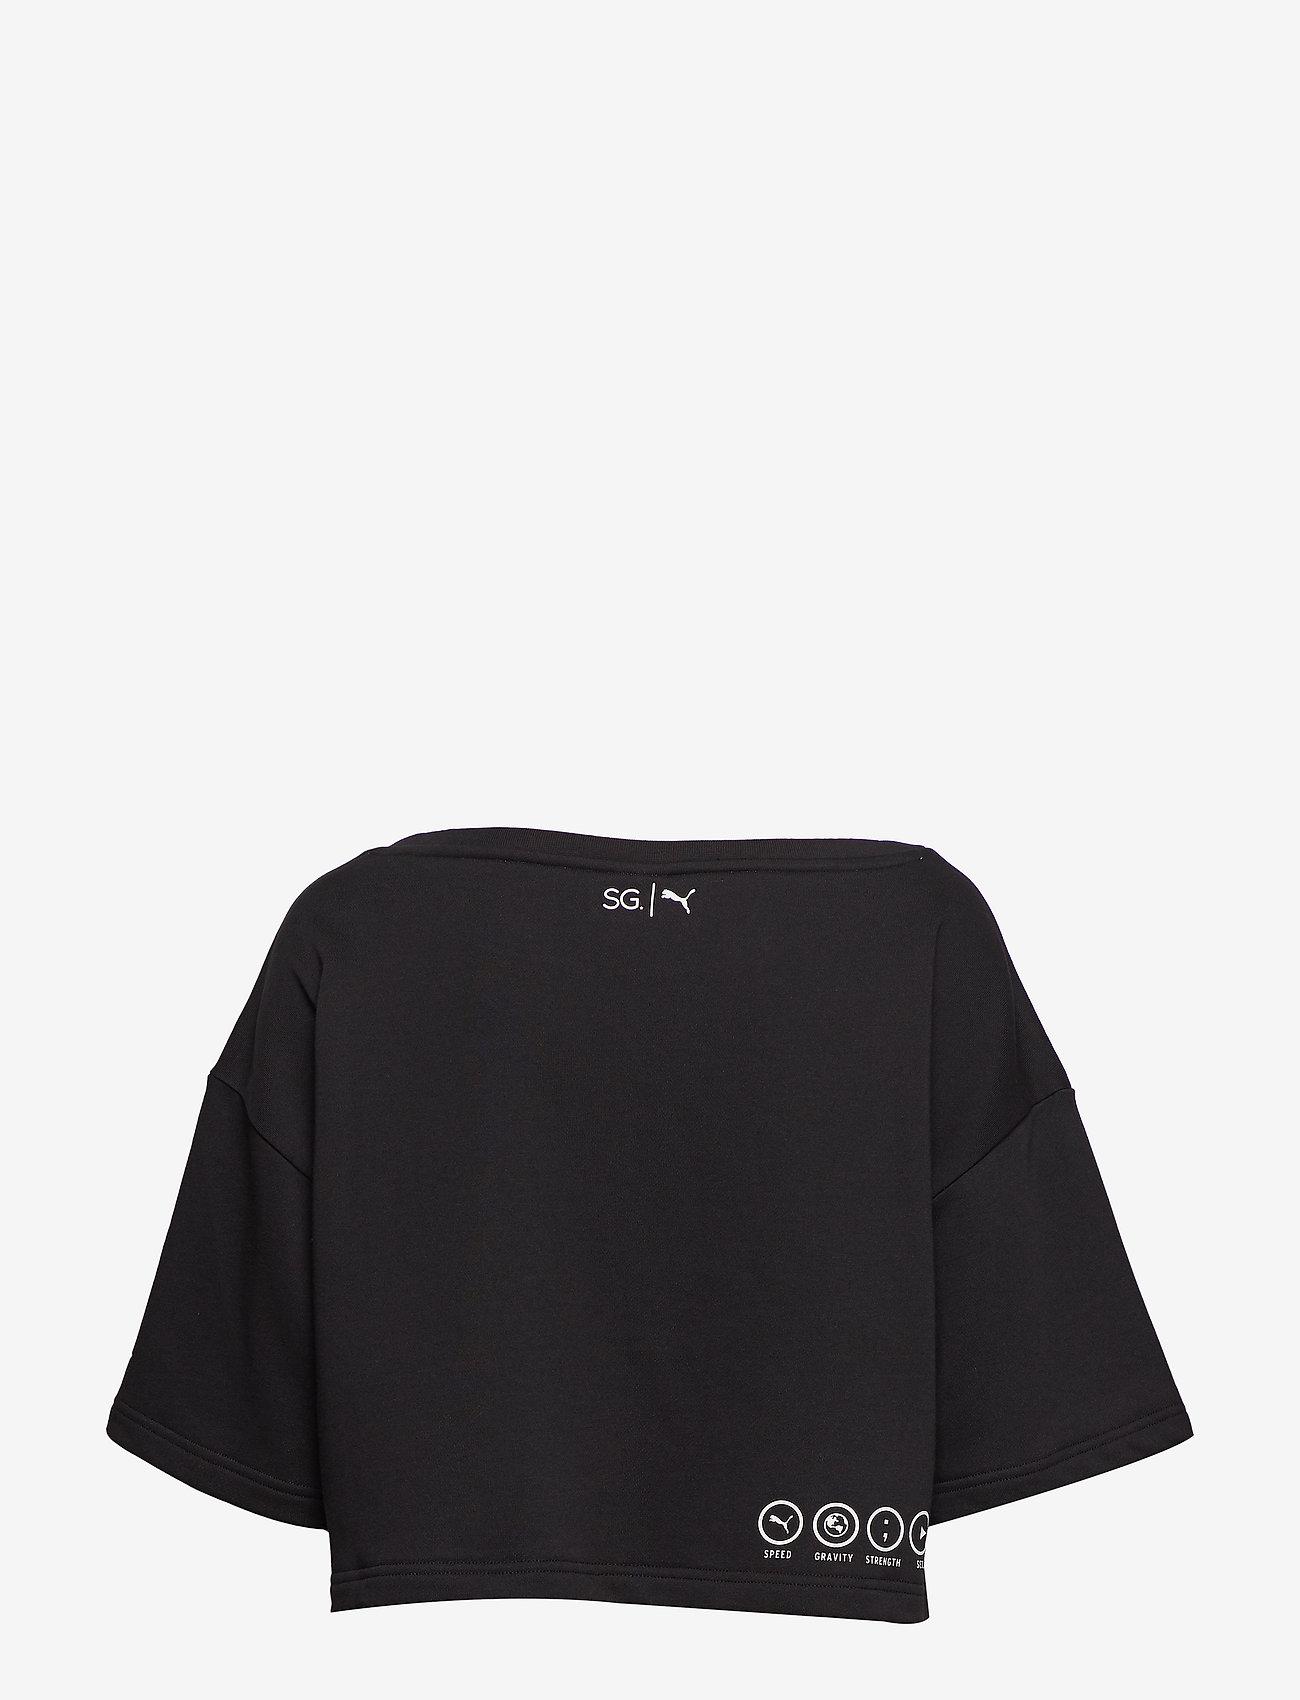 Puma X Sg Sweatshirt (Puma Black) (280 kr) - PUMA